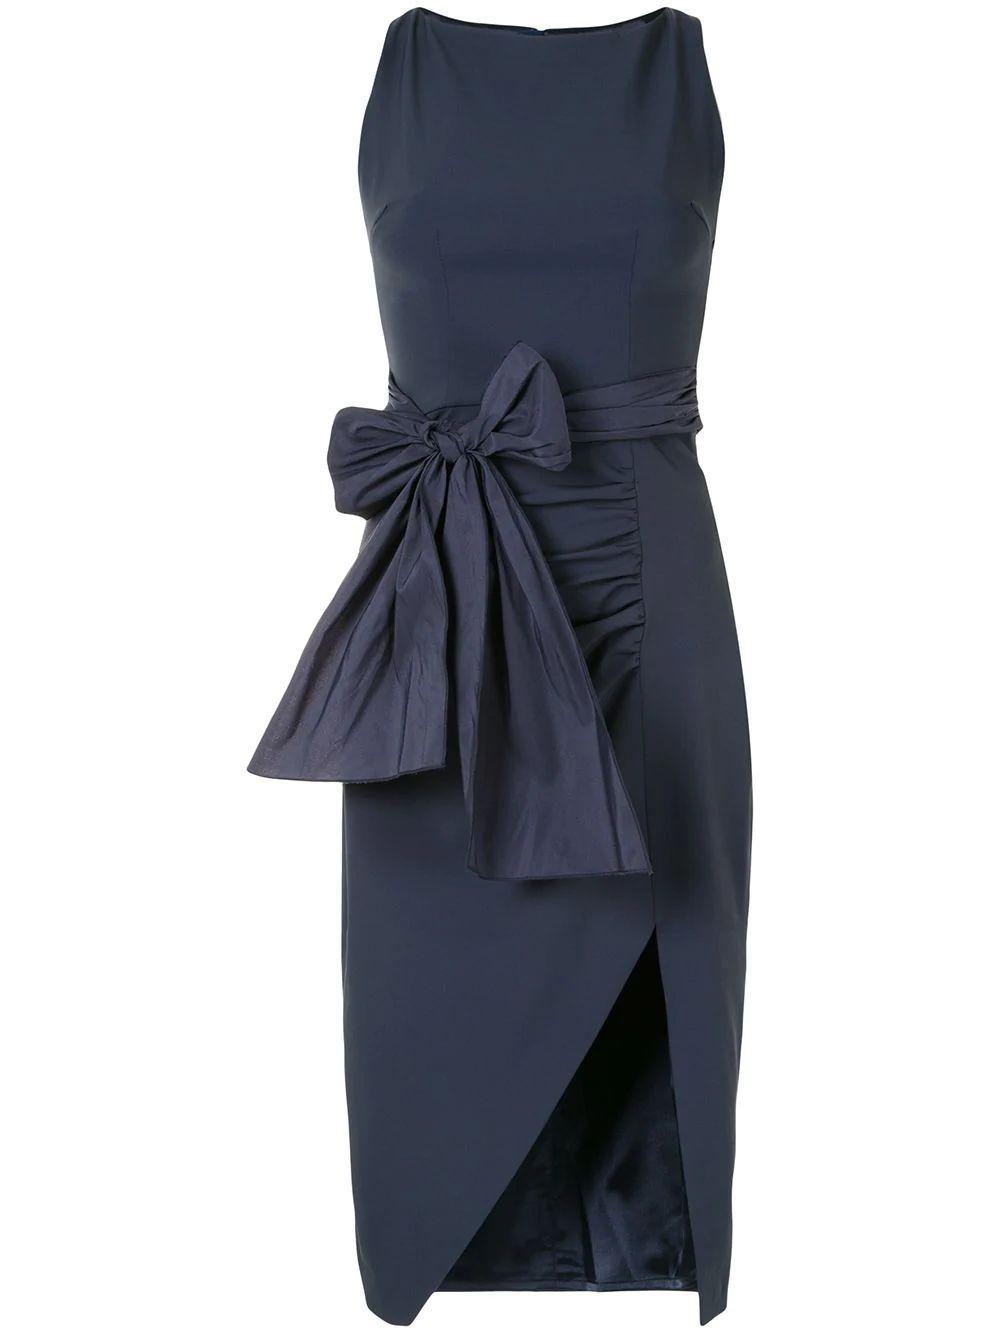 Slit Dress With Bow Belt